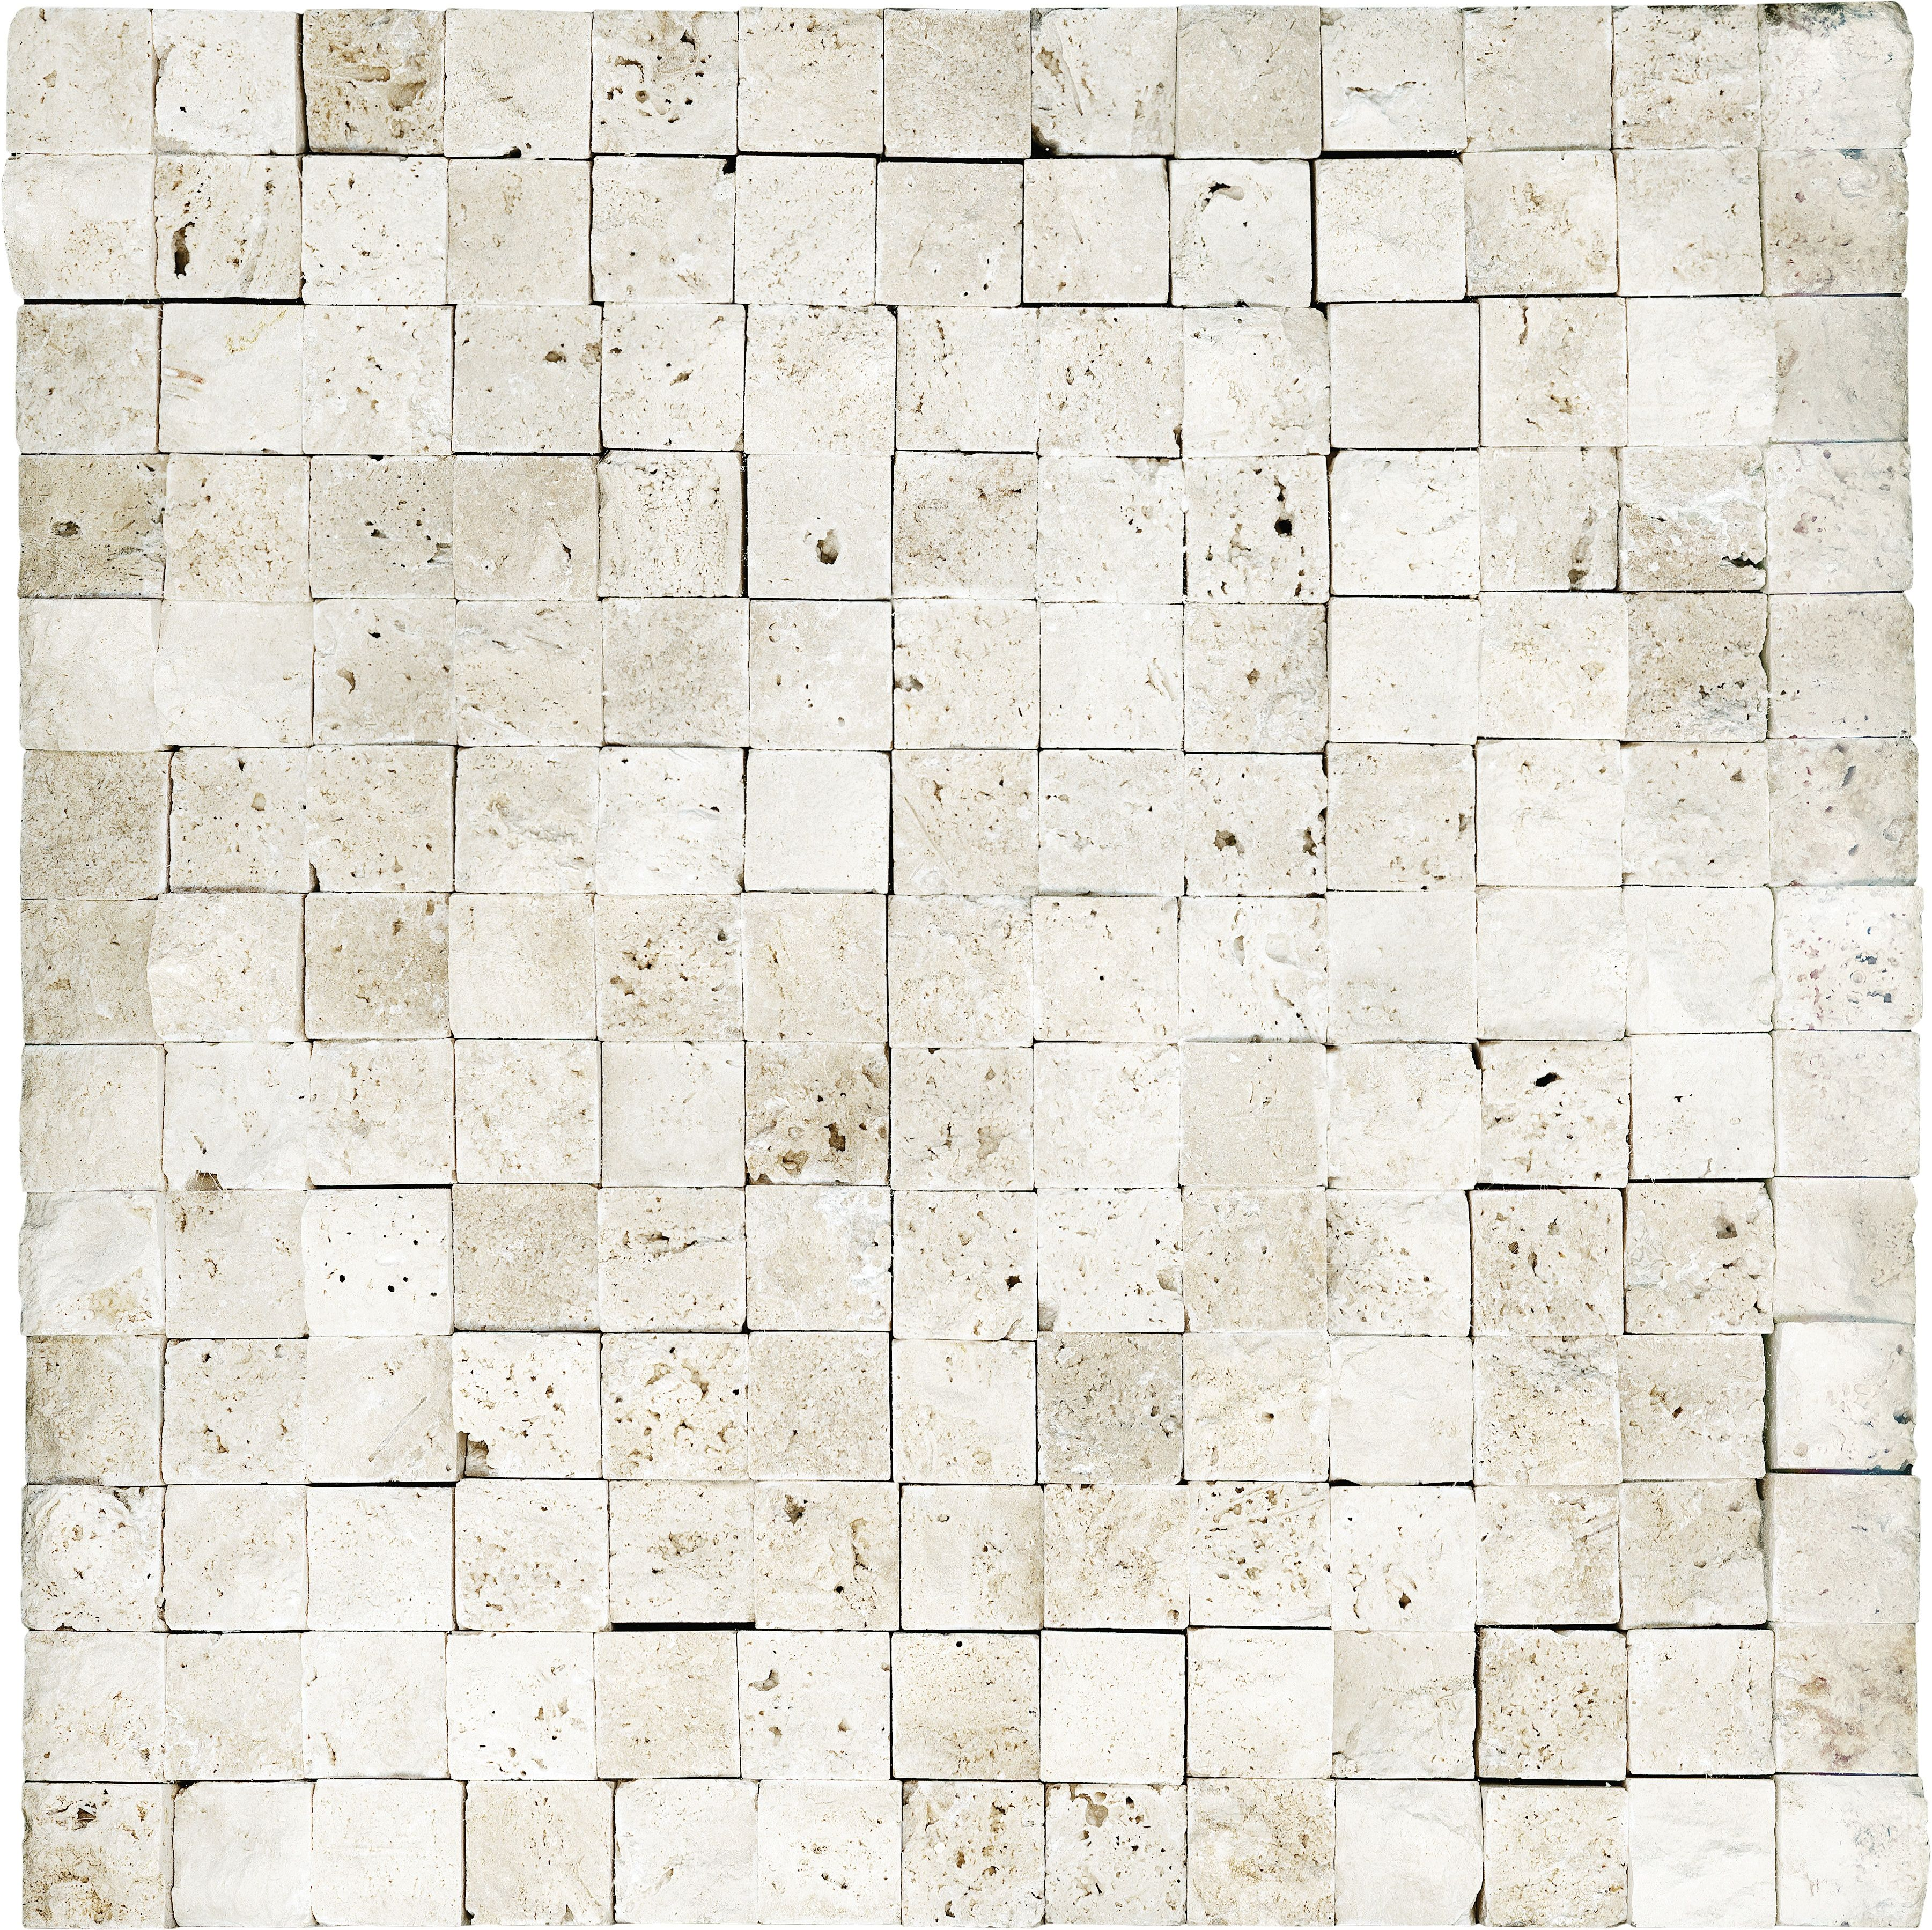 76 025 Split Face Ivory Travertine Mosaics 1 X1 Travertine